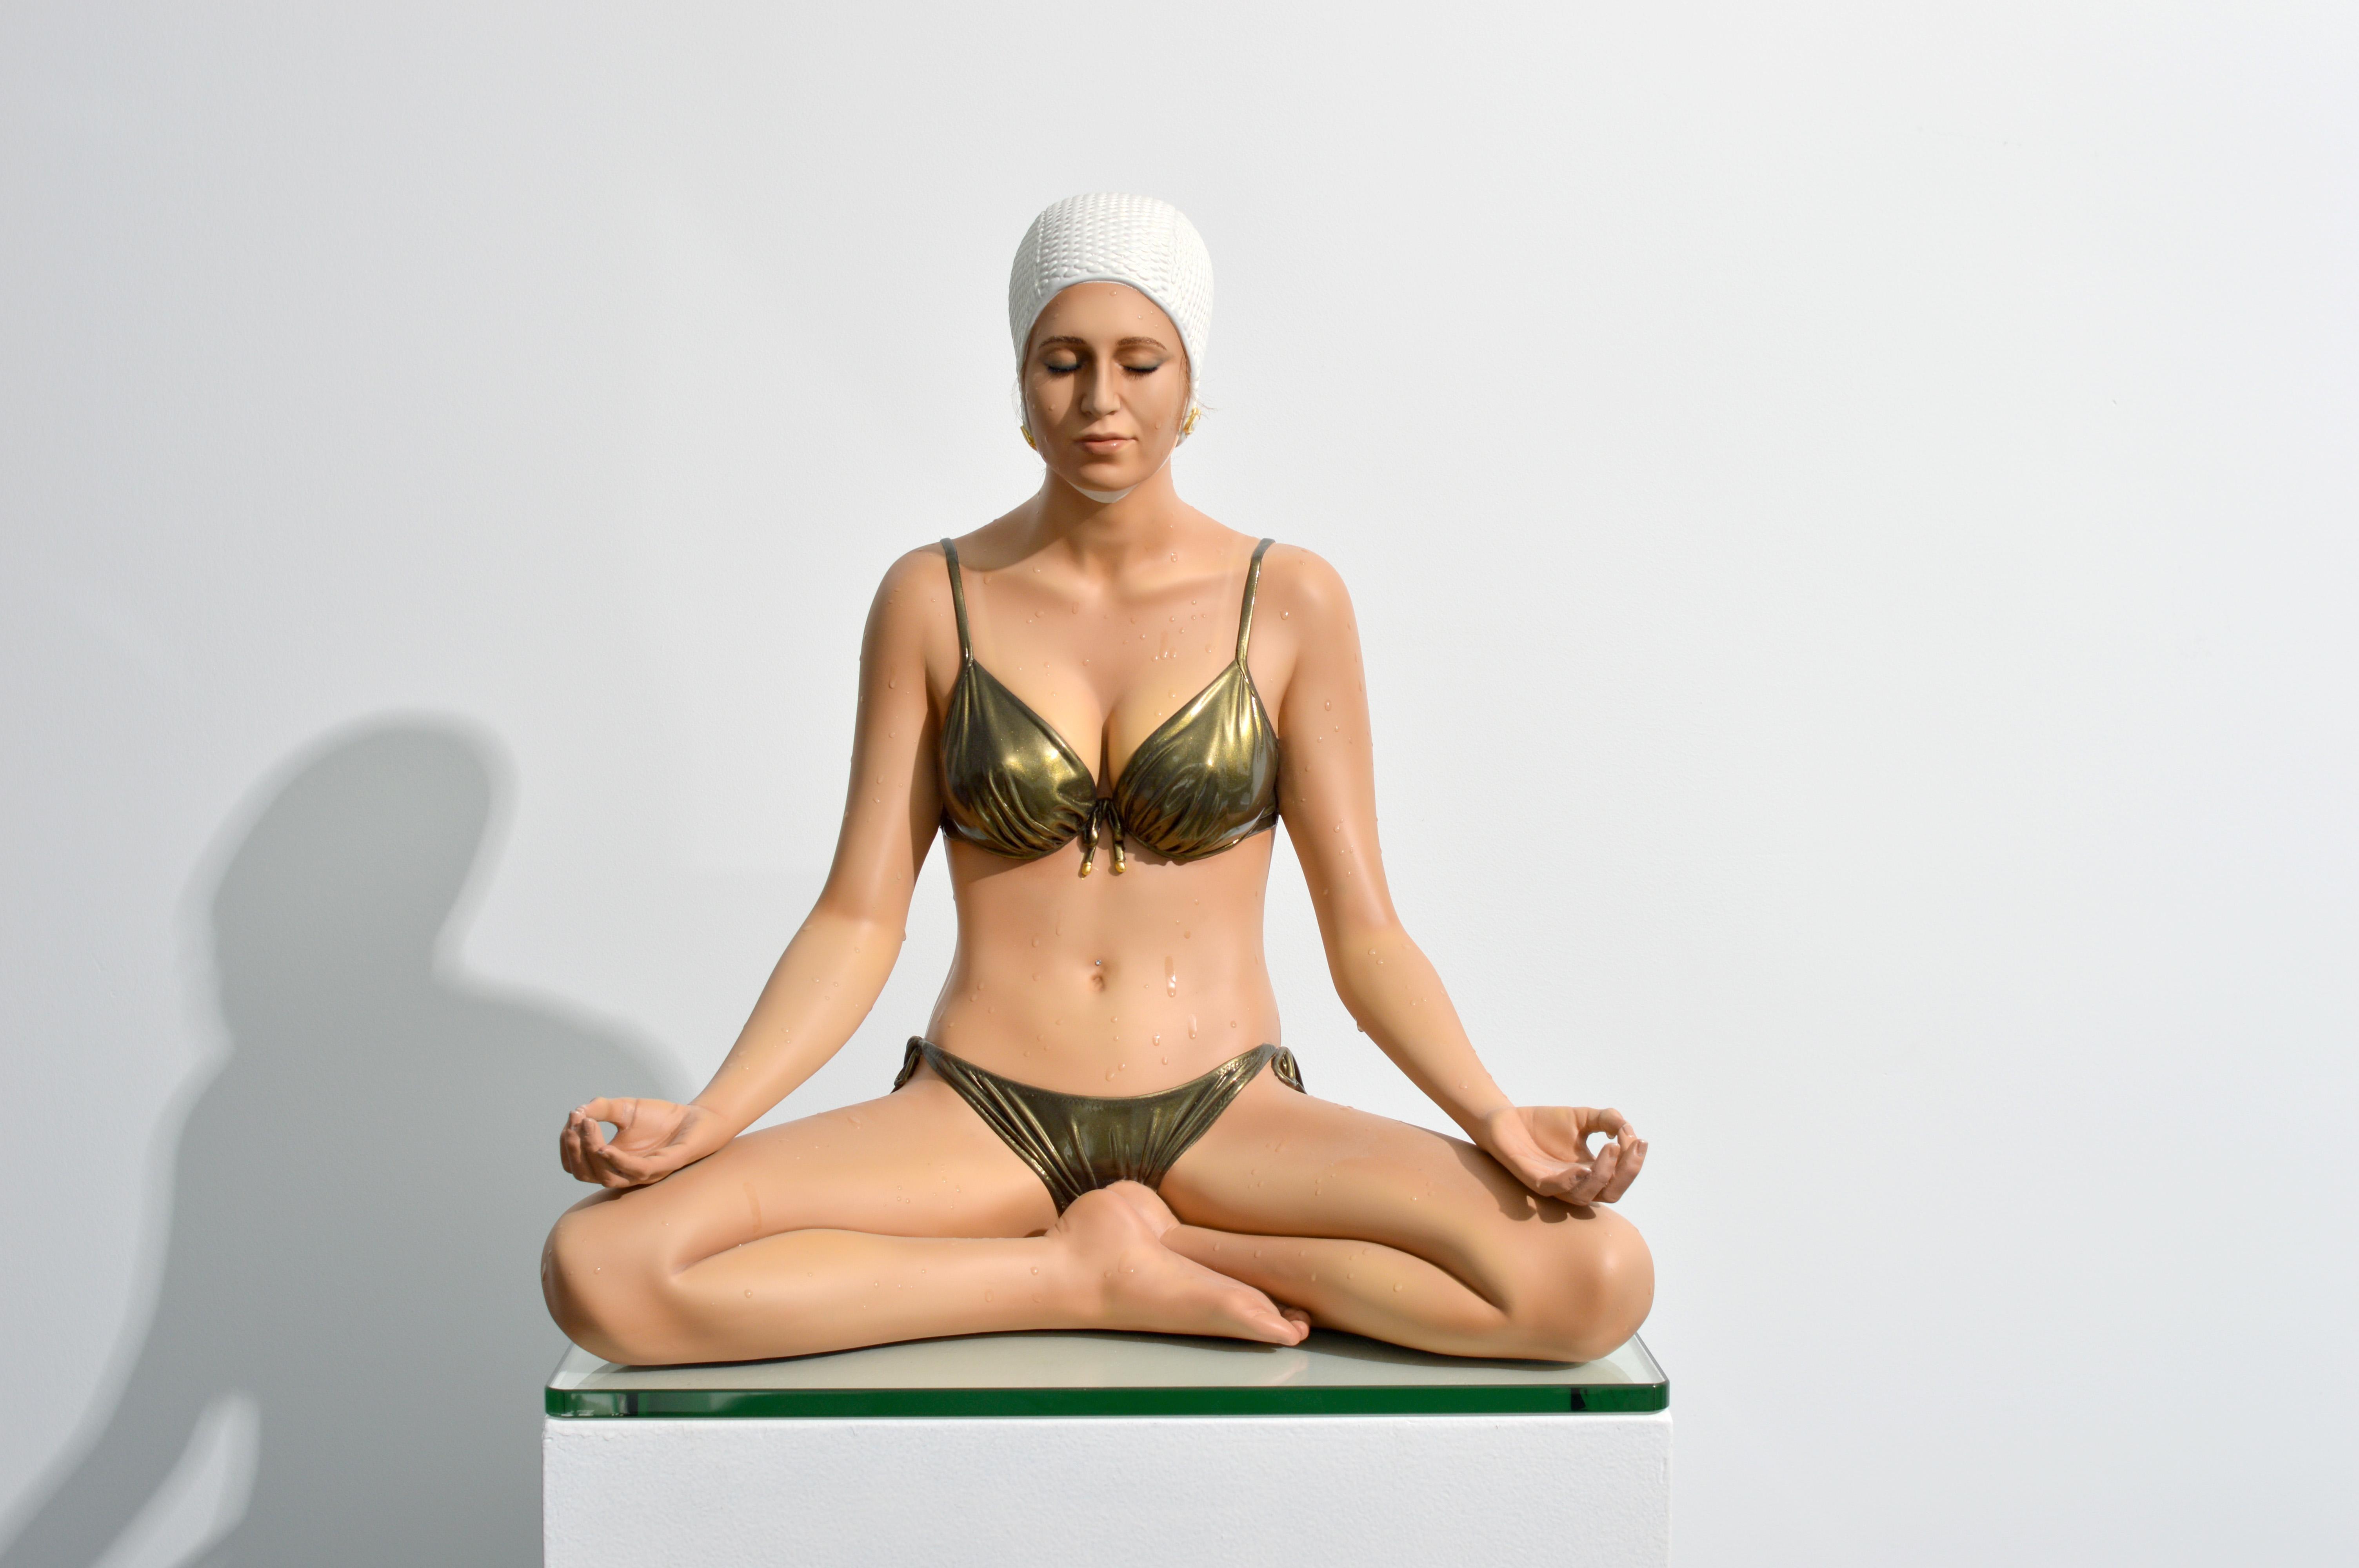 Aesthetic Movement Sculptures